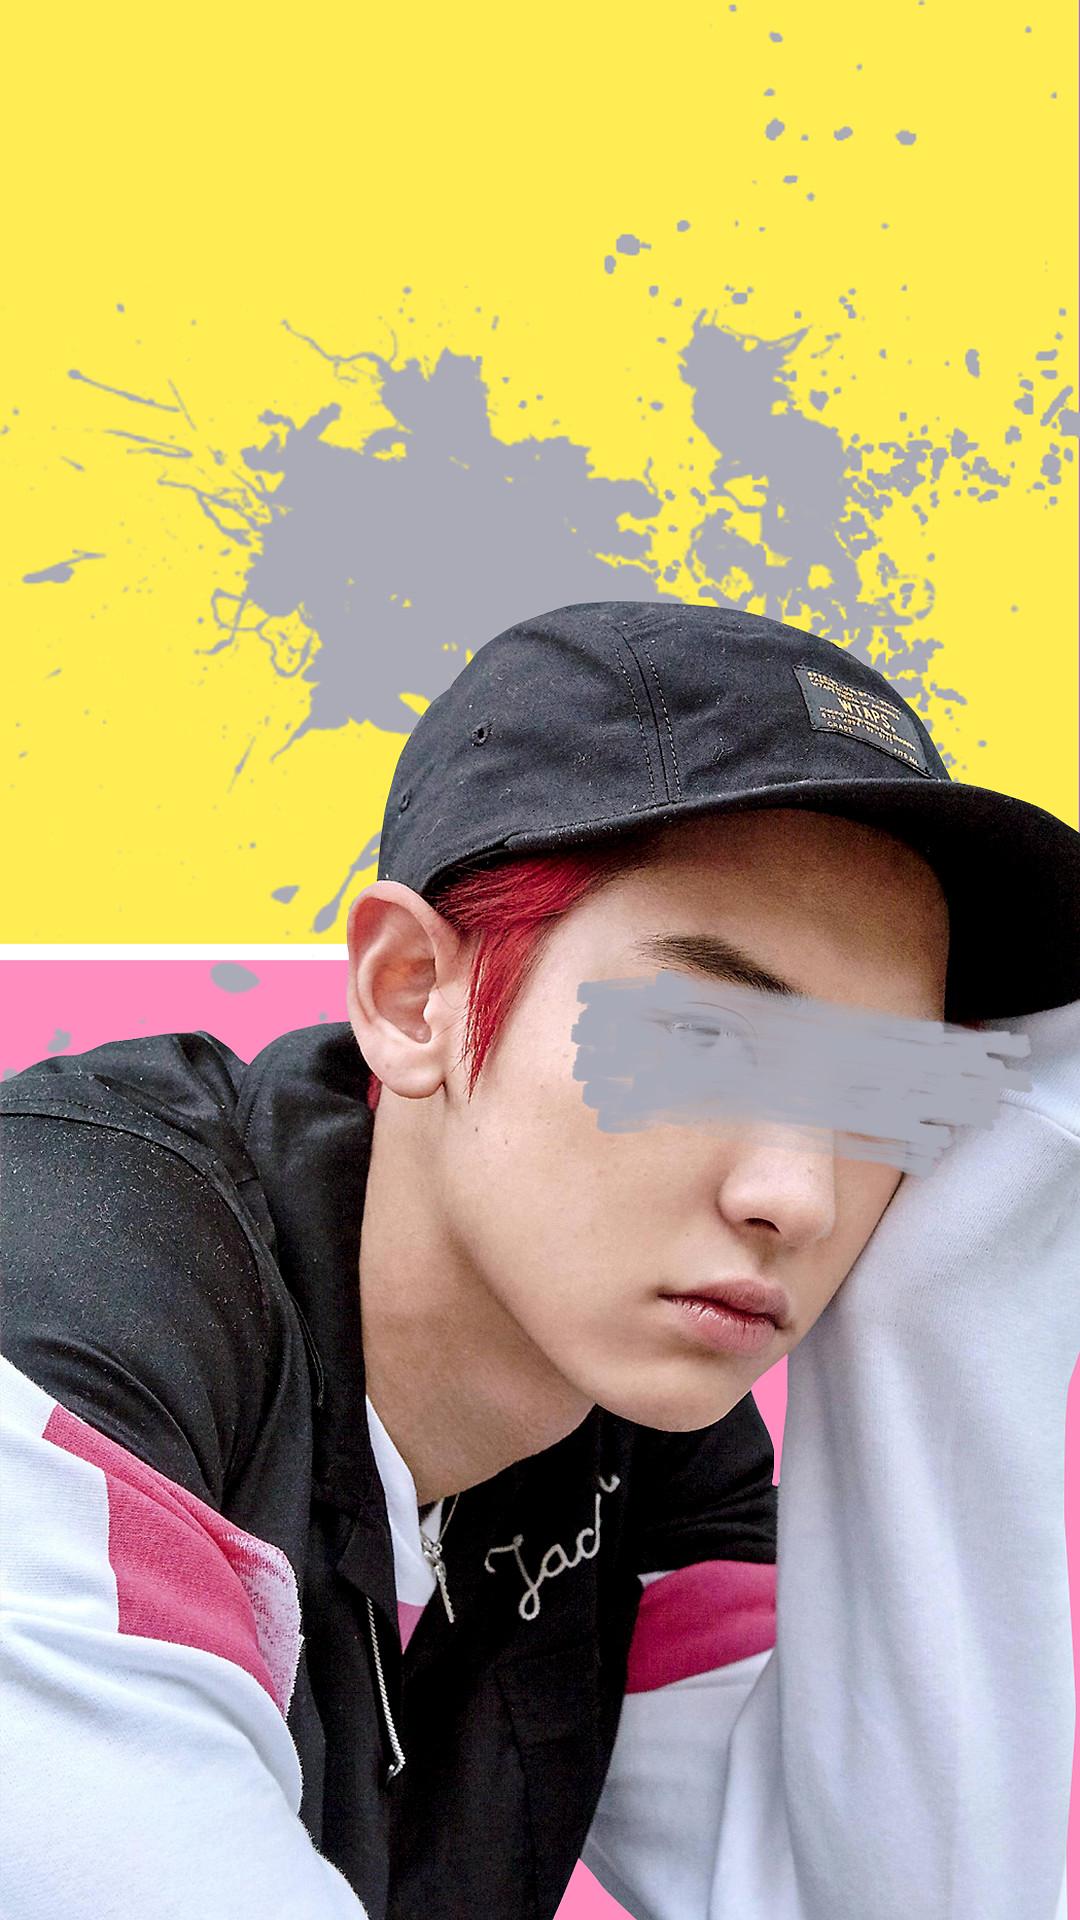 Wallpaper Song Joong Ki Cute Baekhyun Wallpapers 84 Images